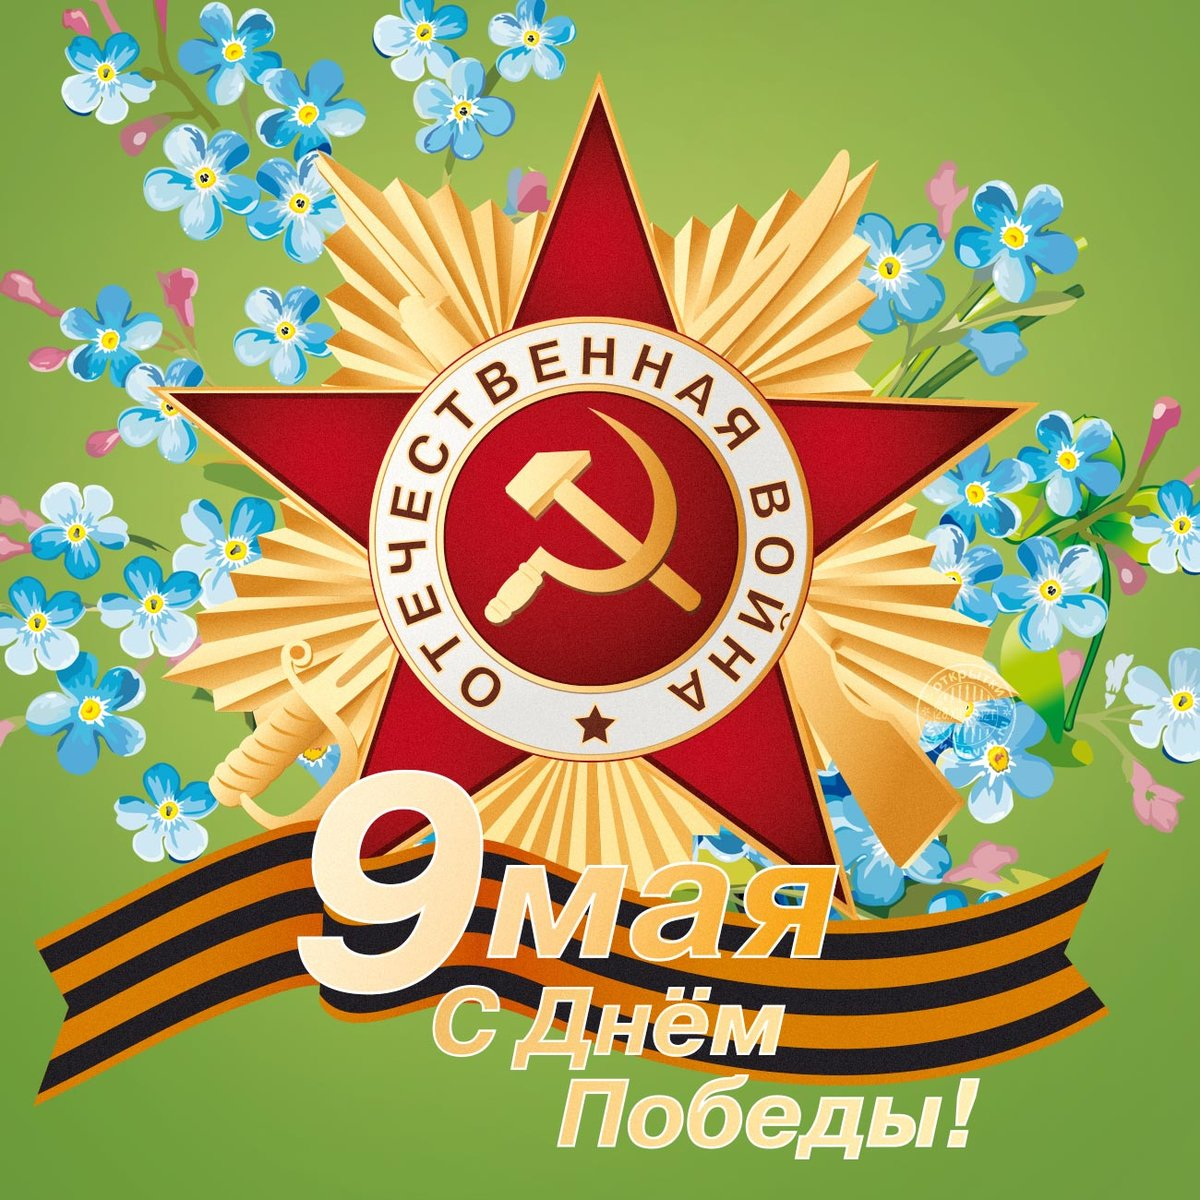 Открытка видео, картинки открыток ко дню победы